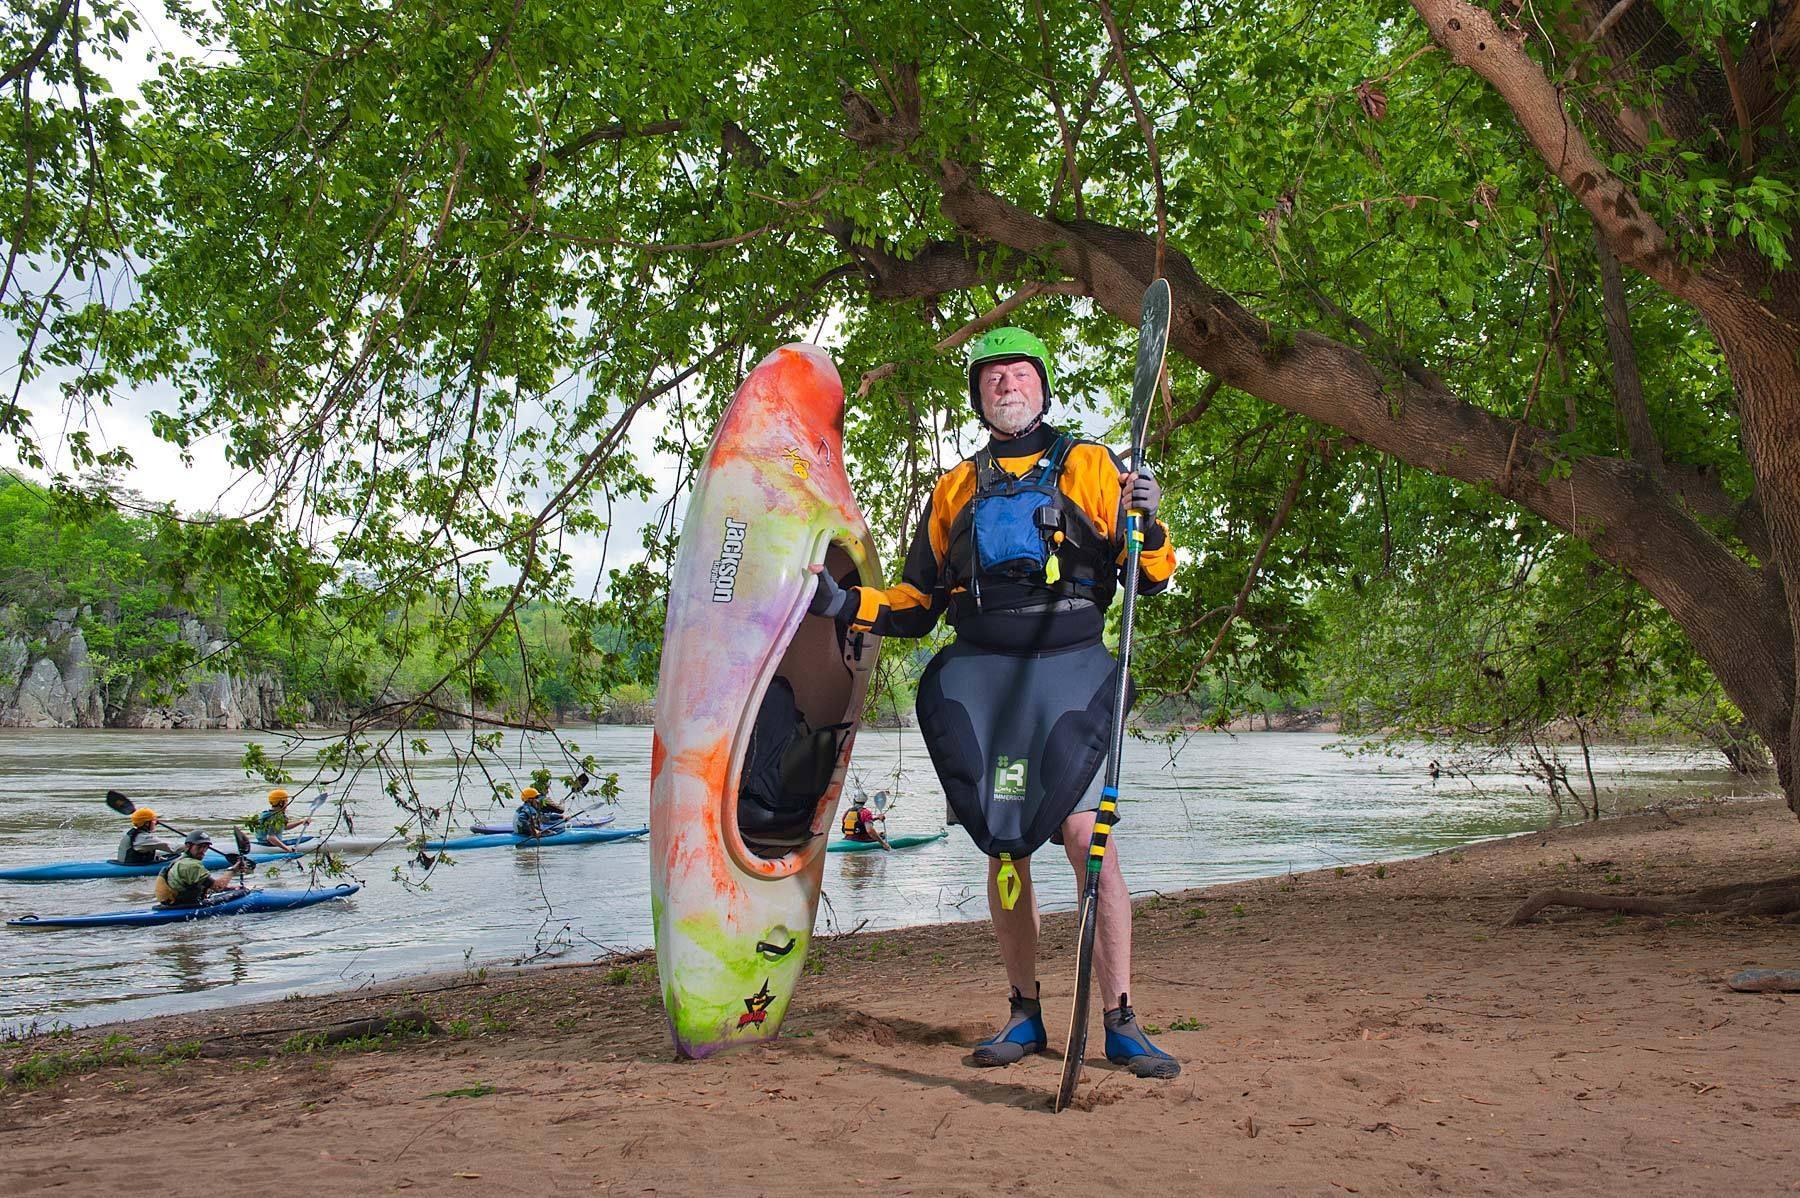 1portrait_of_a_kayaker